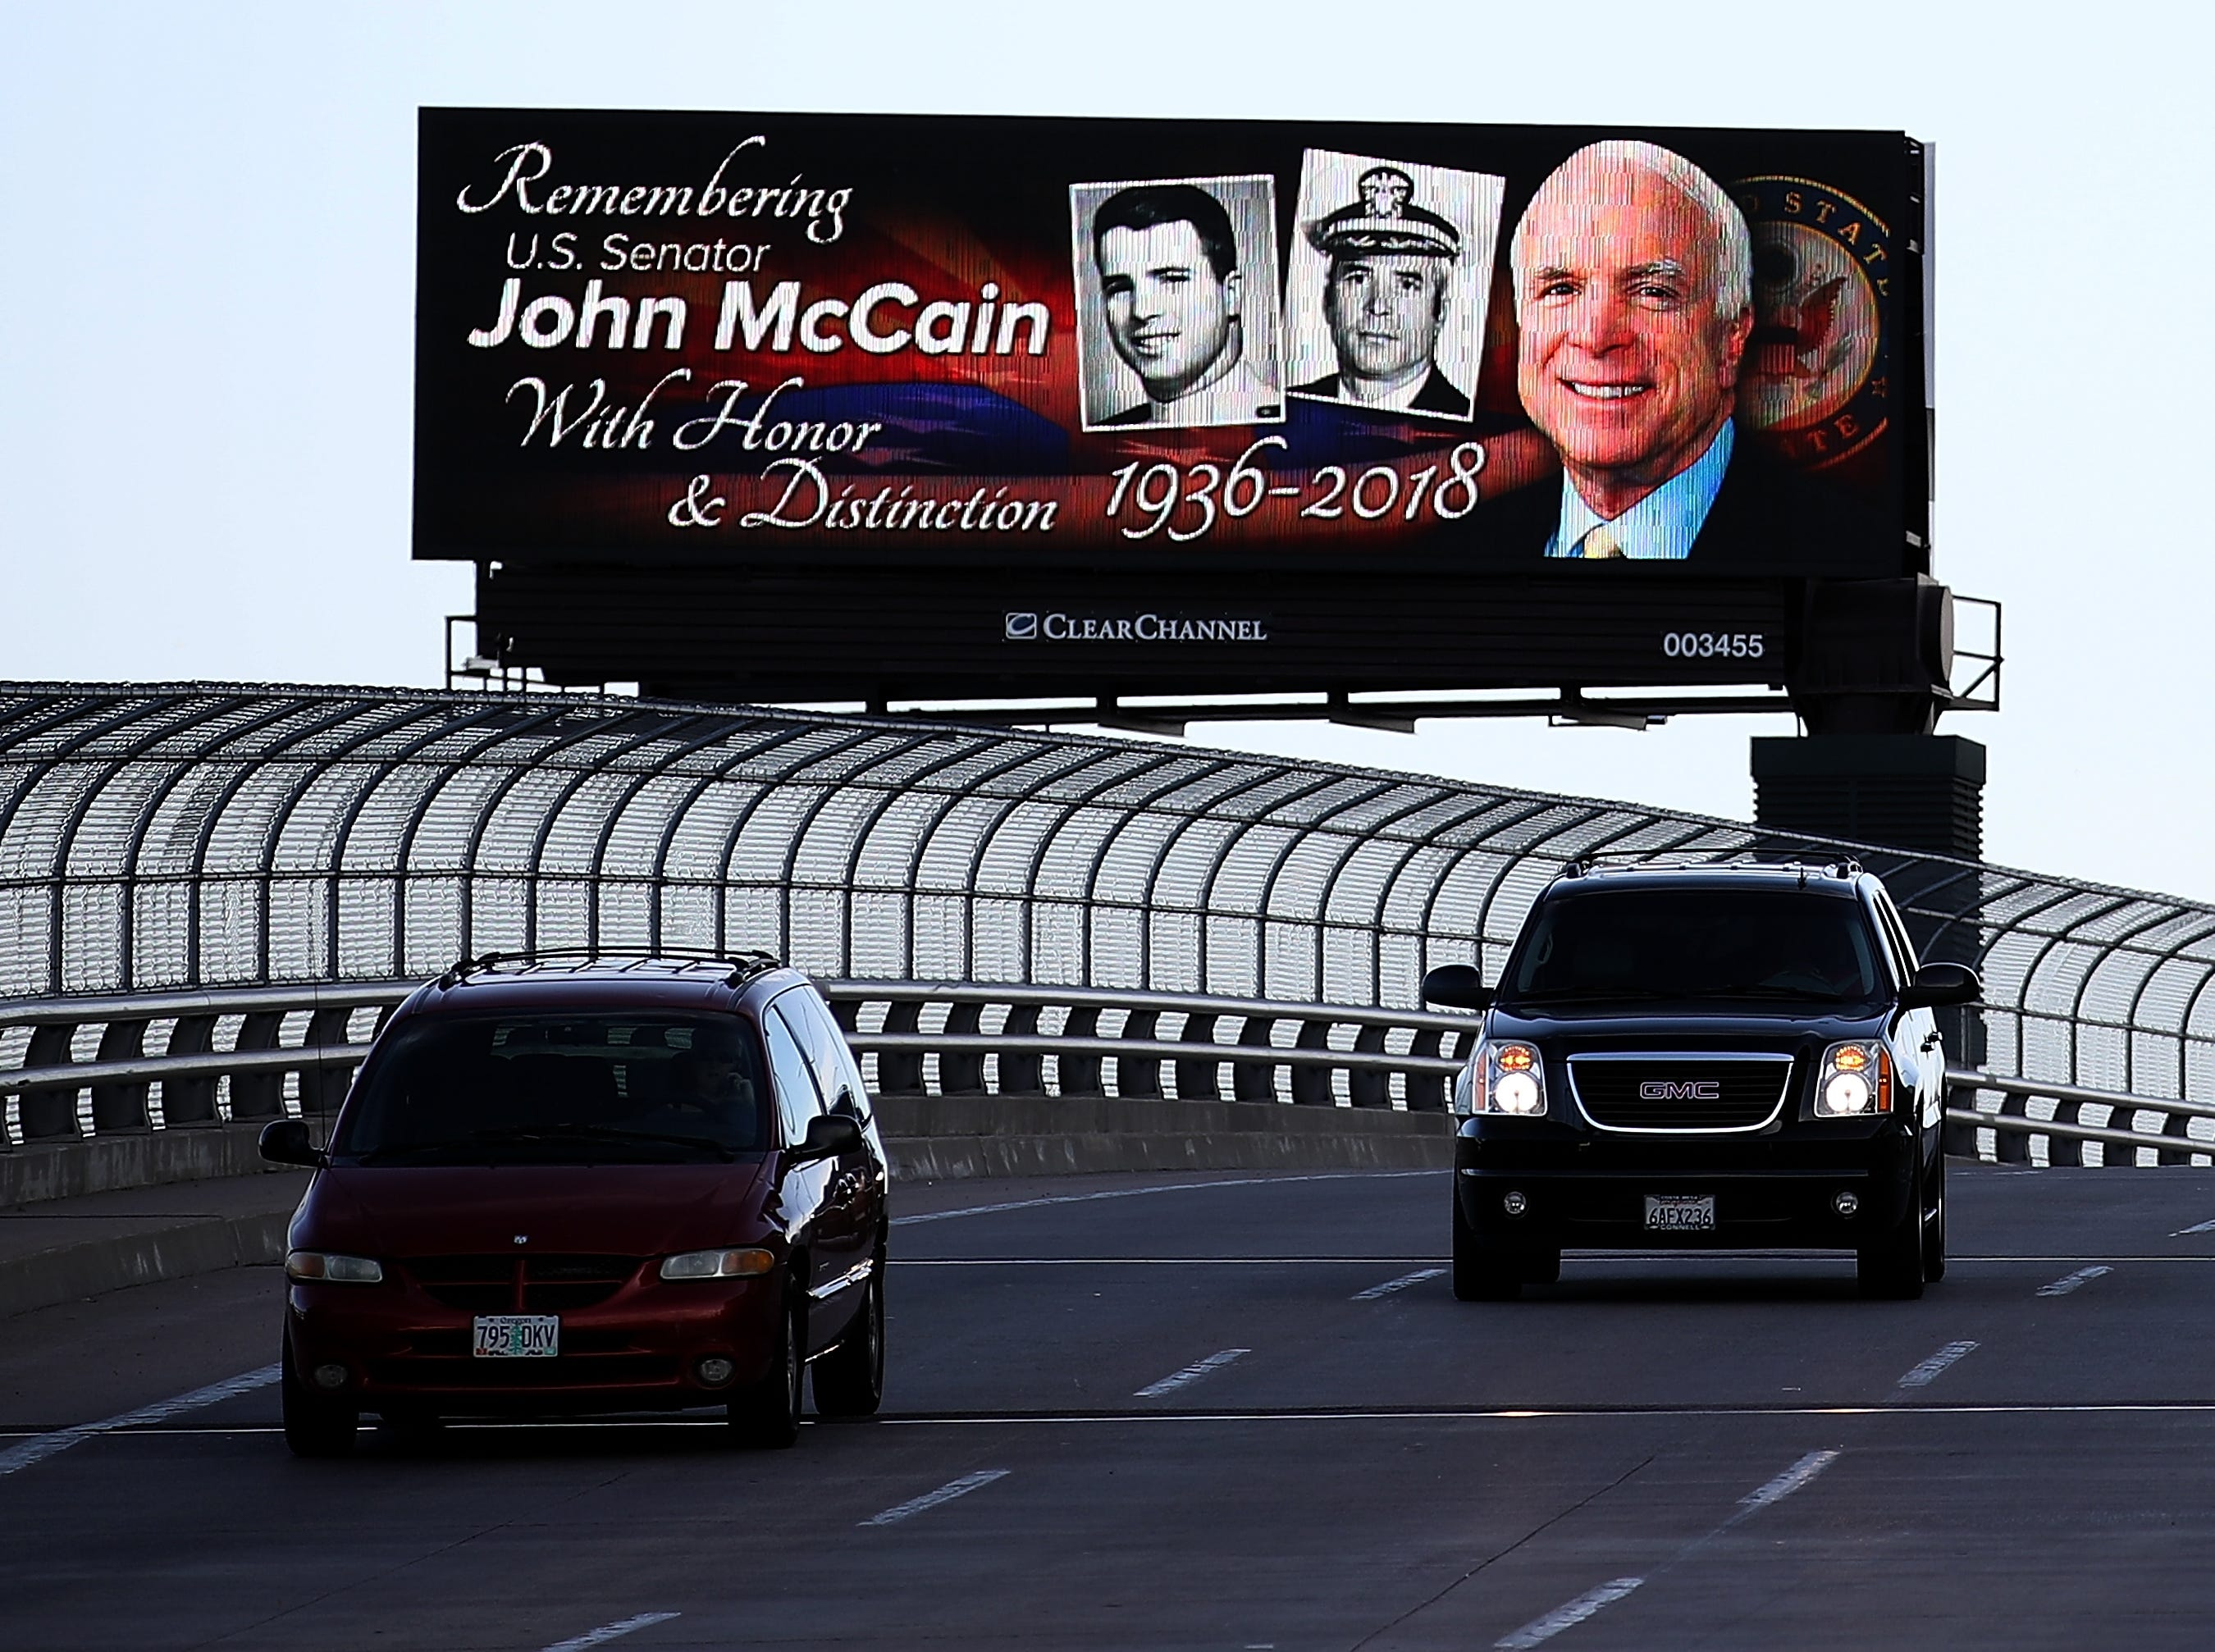 Cars drive by a billboard with a message honoring U.S. Sen. John McCain on Aug. 27, 2018 in Phoenix, Arizona.